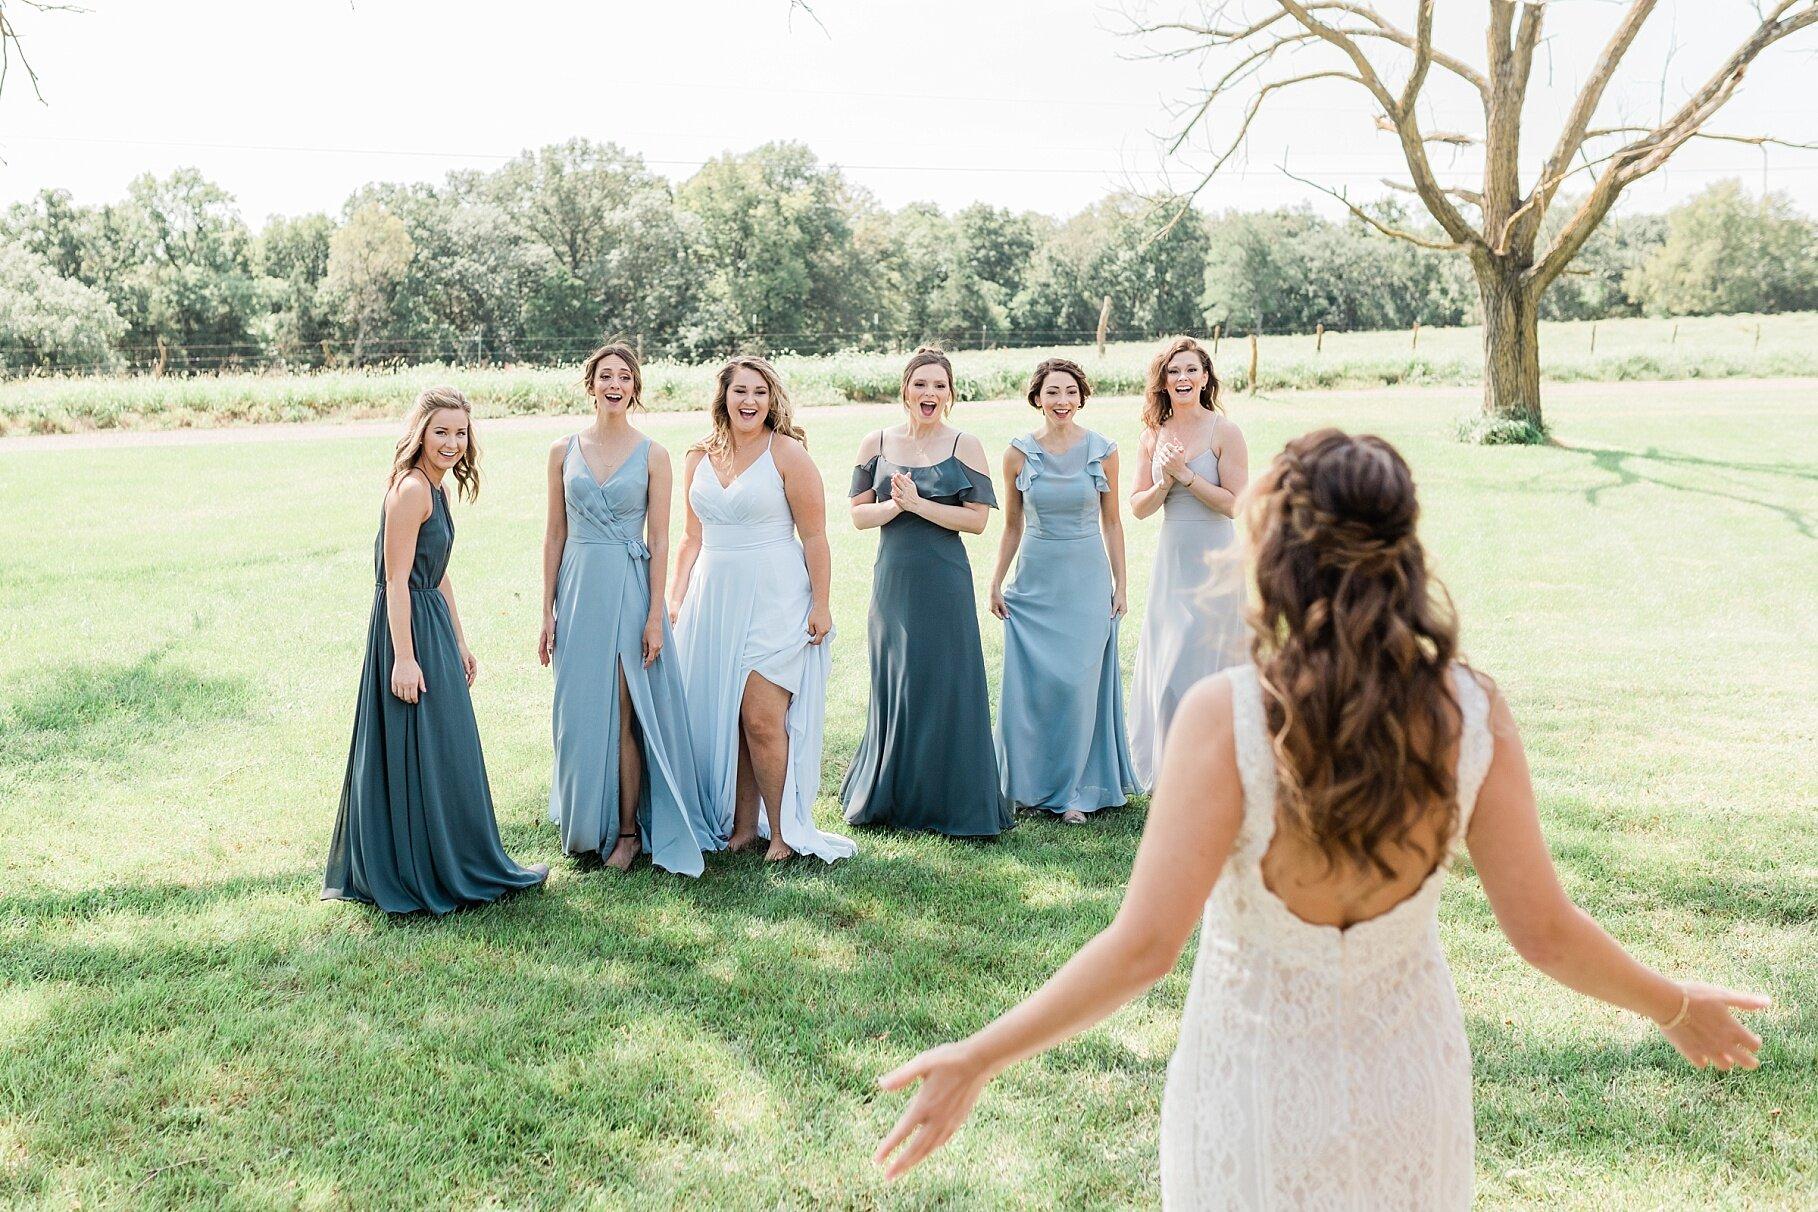 Earth-Toned Wedding by KKP Associate Wedding Photographer and Kelsi Kliethermes Photography Best Columbia Missouri Wedding Photographer_0019.jpg